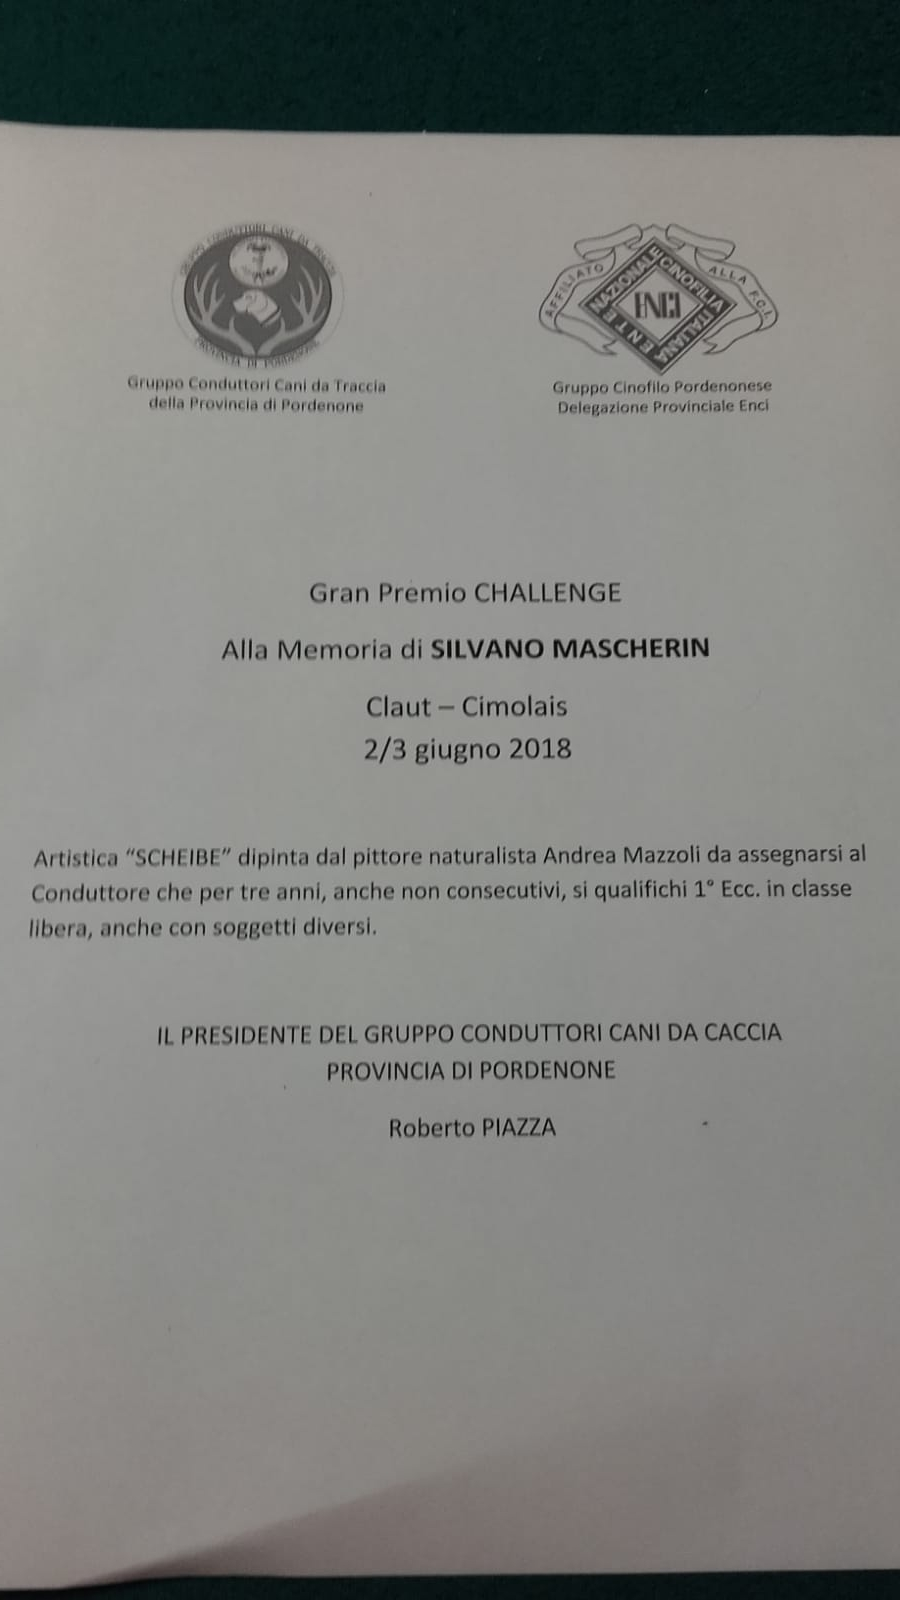 Regolamento Memoriale 'Silvano Mascherin'